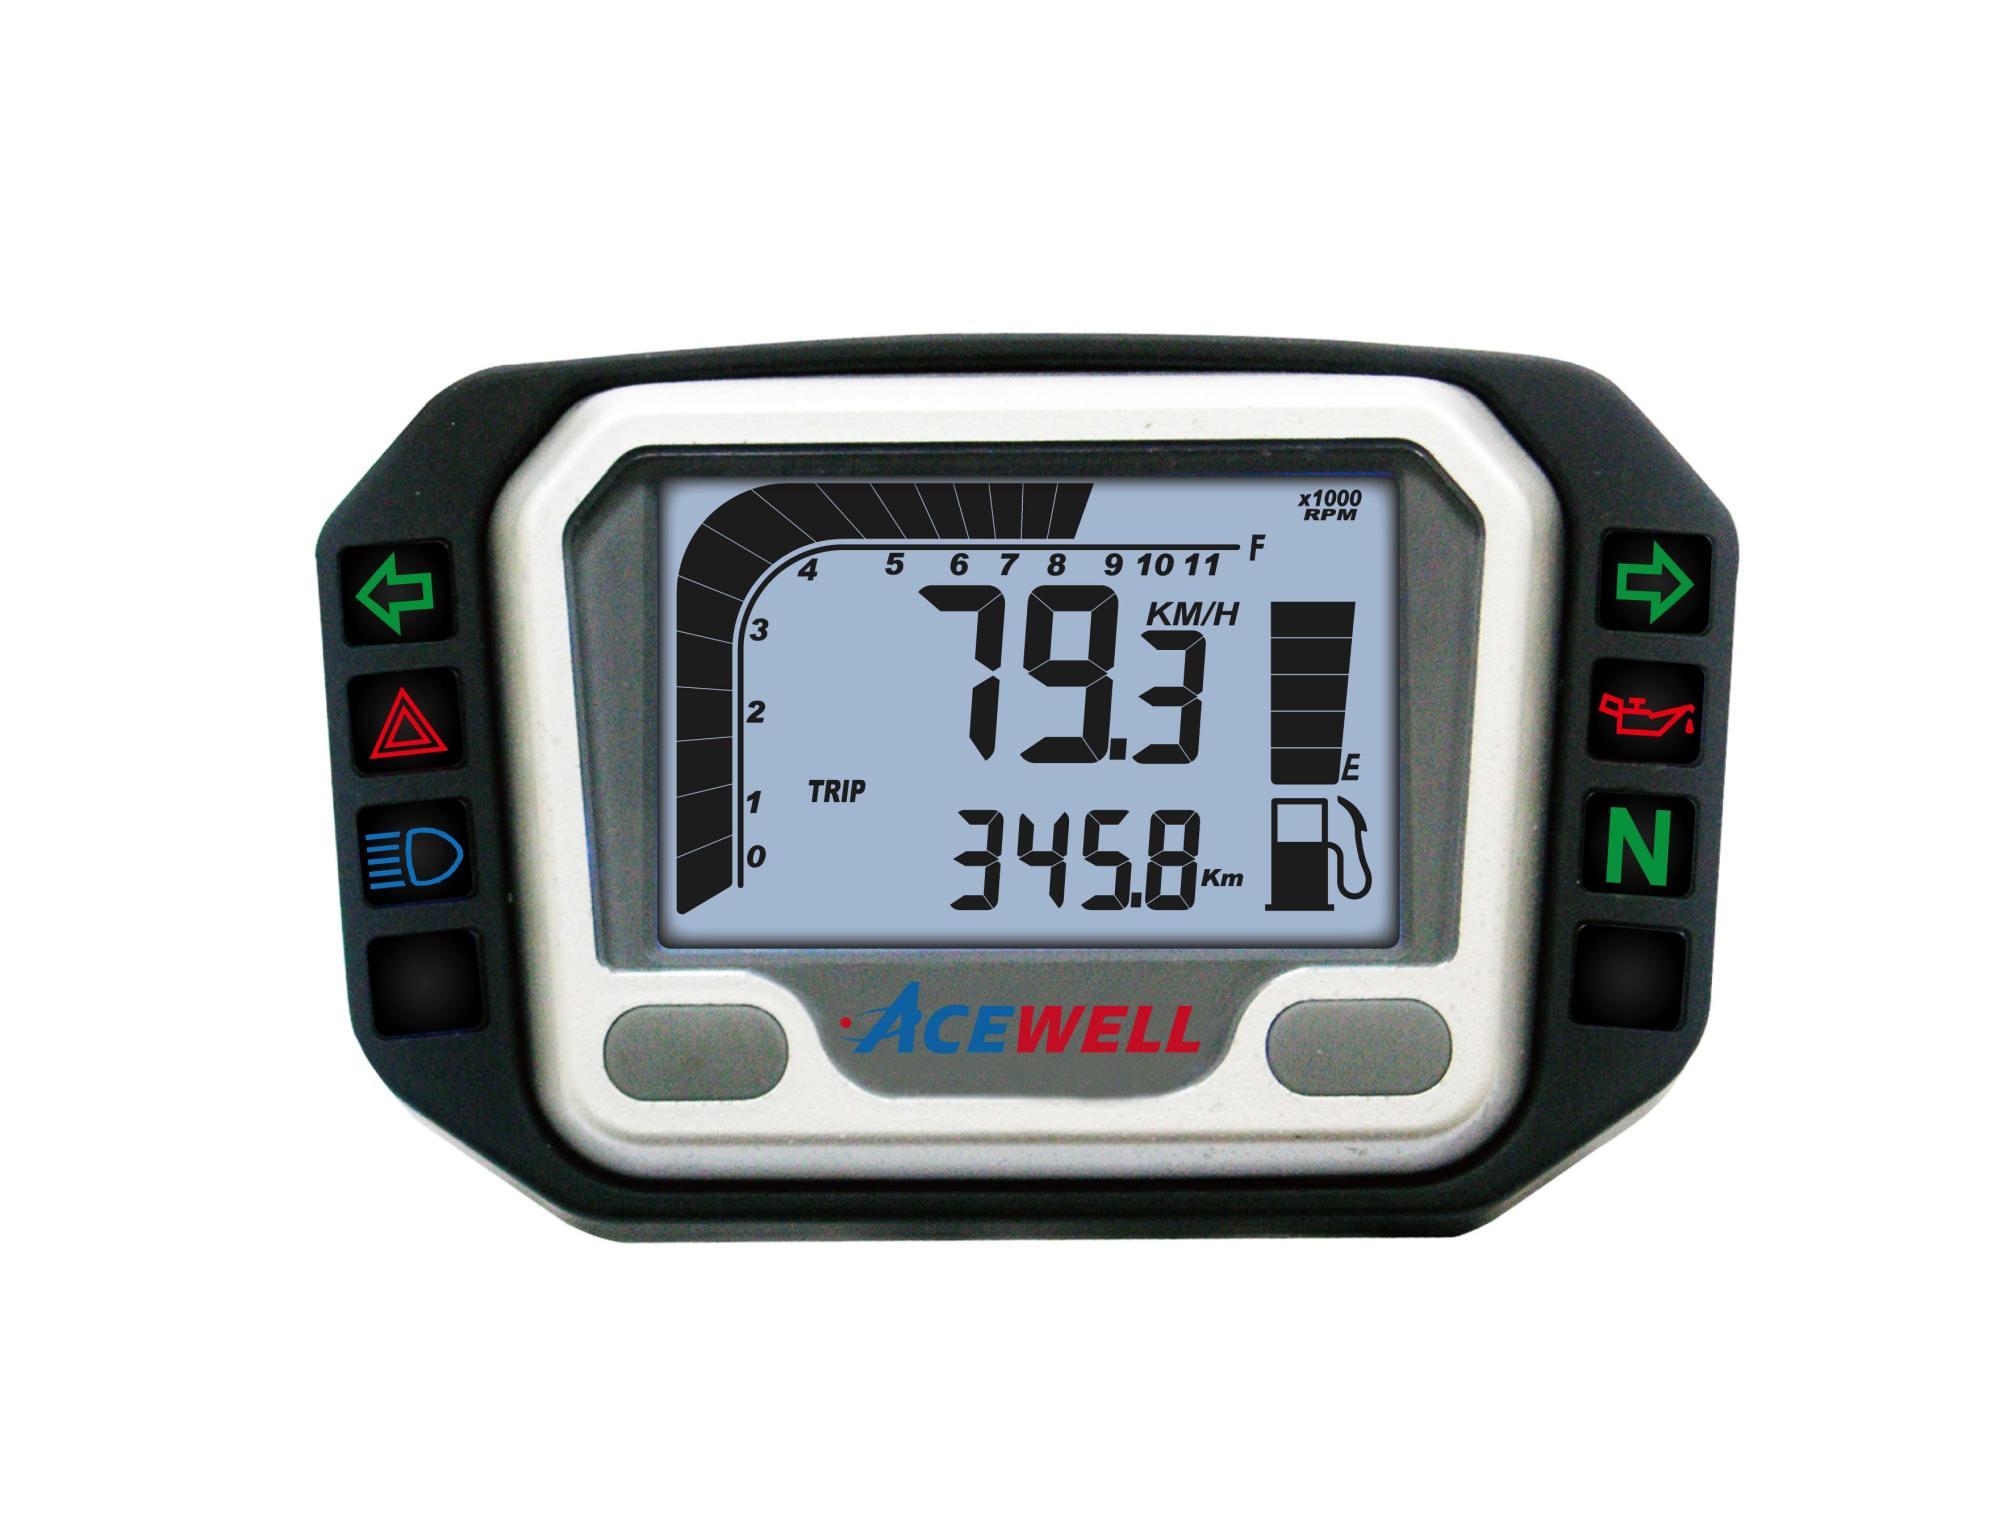 hight resolution of ace 3000 sereis digital lcd display multi function speedometer